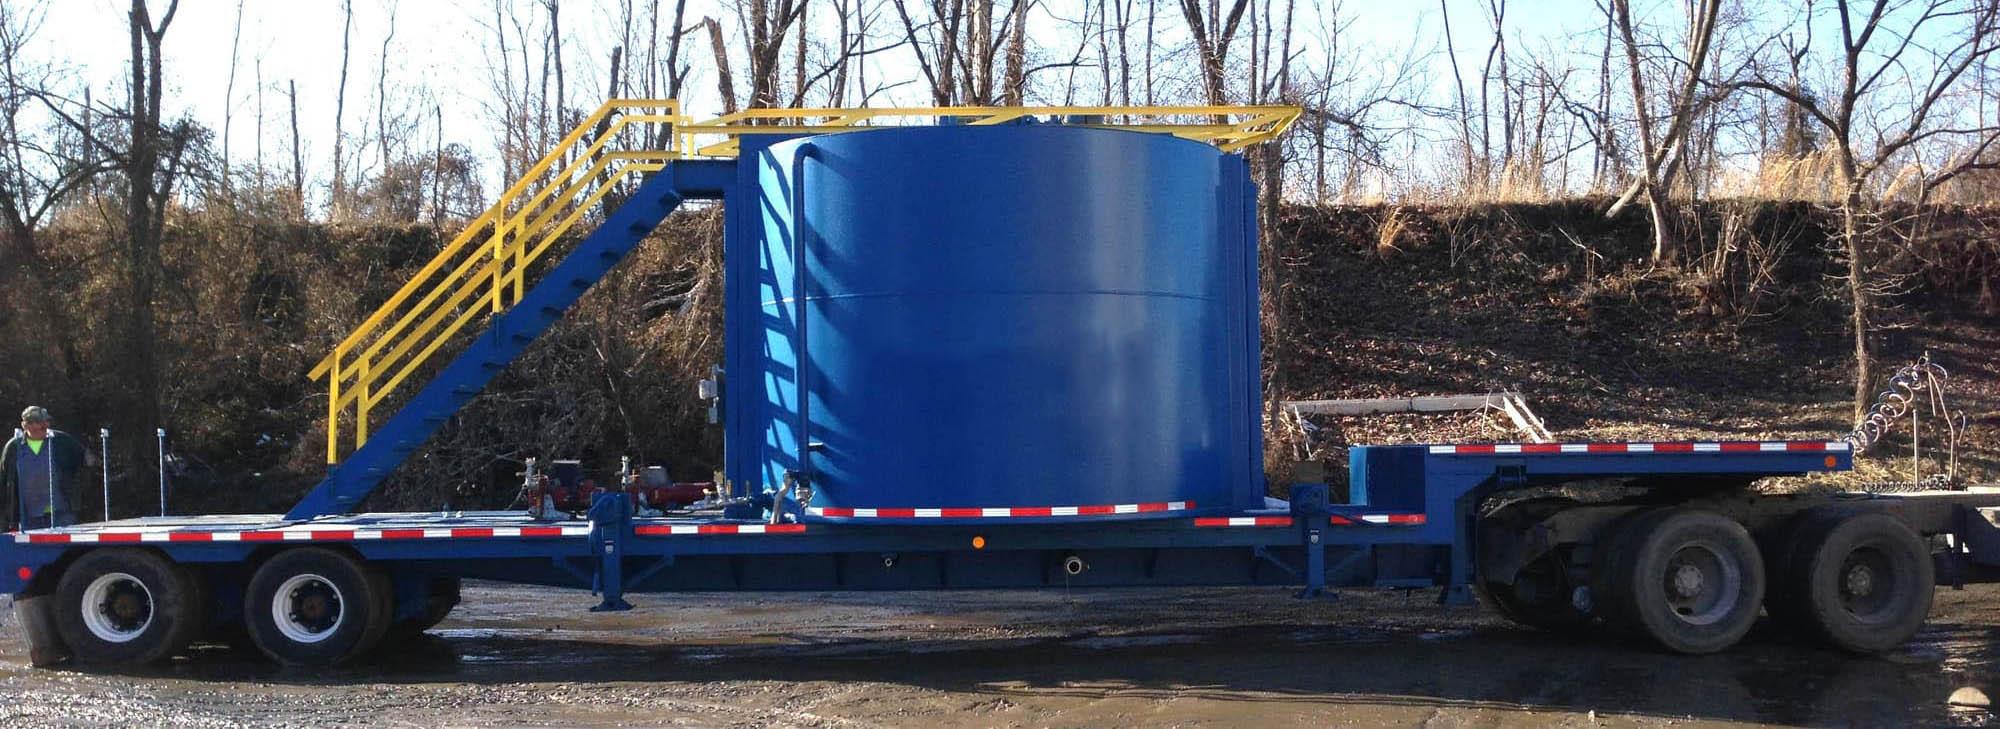 7,000 gallon total capacity, 460V